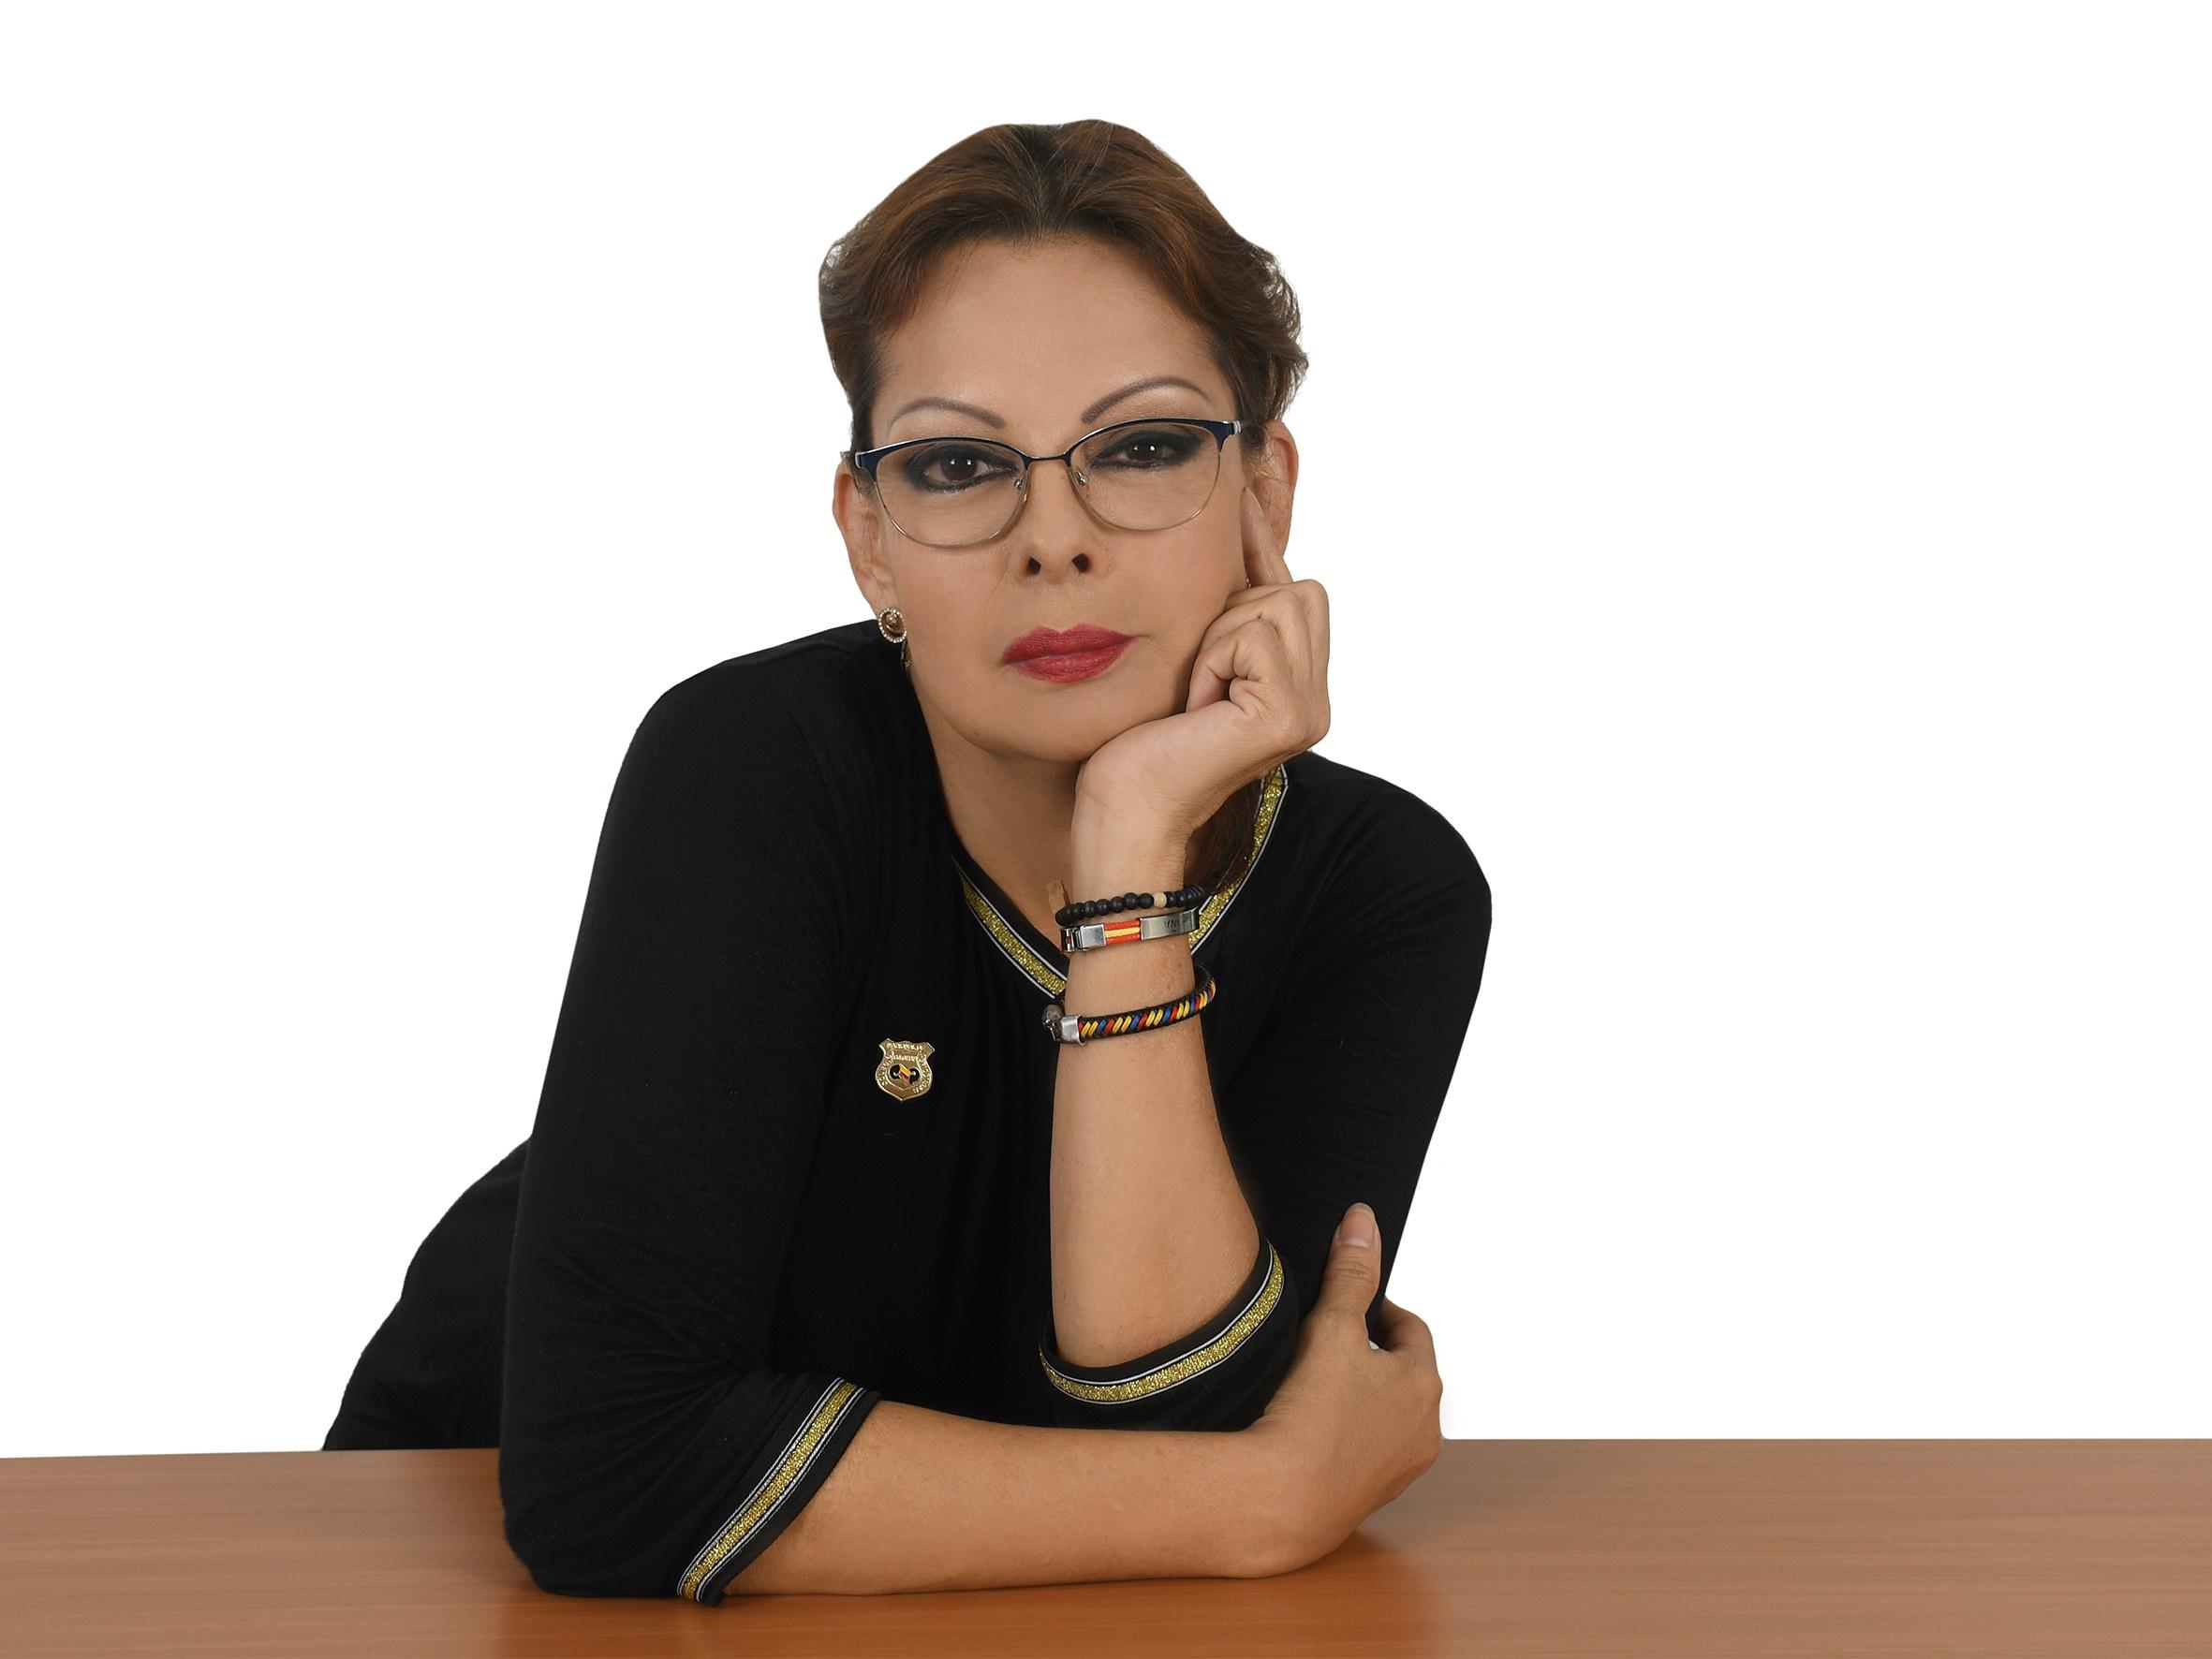 Toledo Becerra, la candidata que le propone concejal para la comuna 7 | EL FRENTE